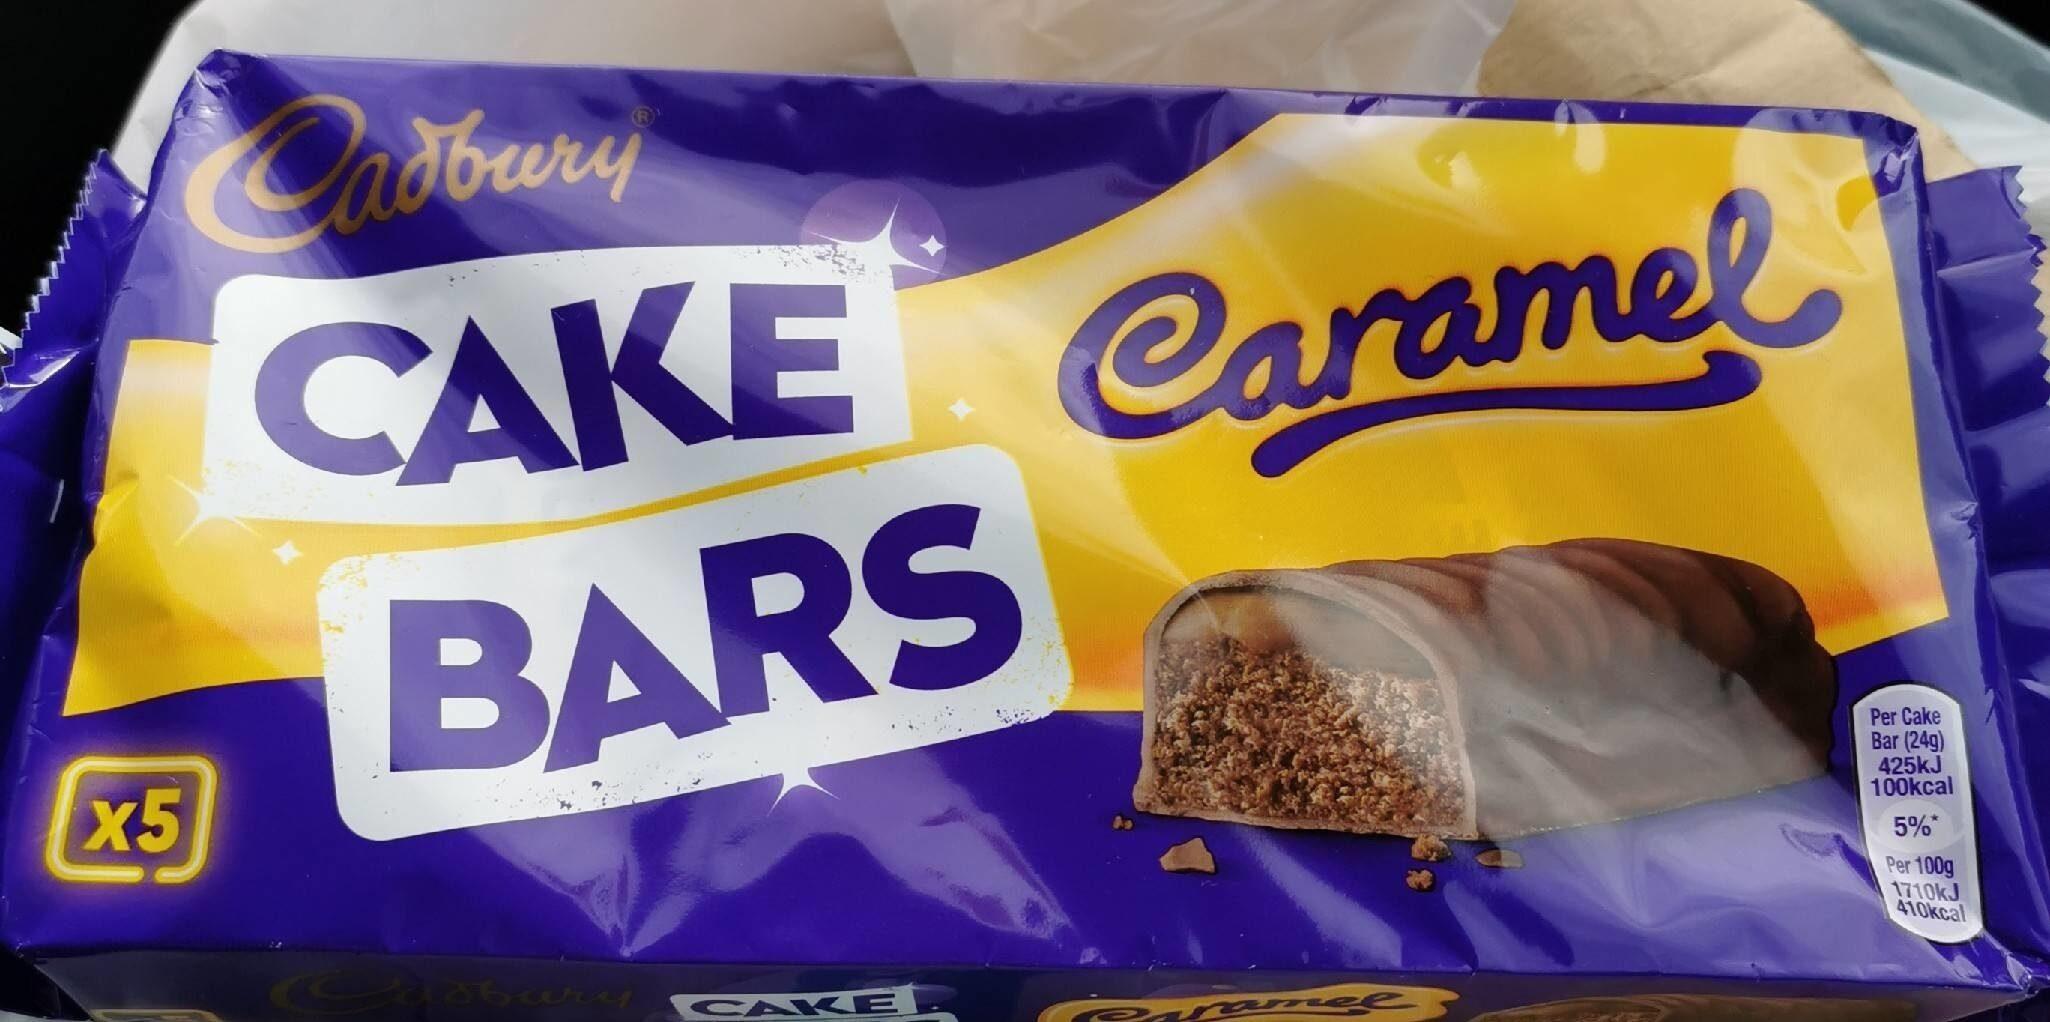 Cake bars caramel - Product - en